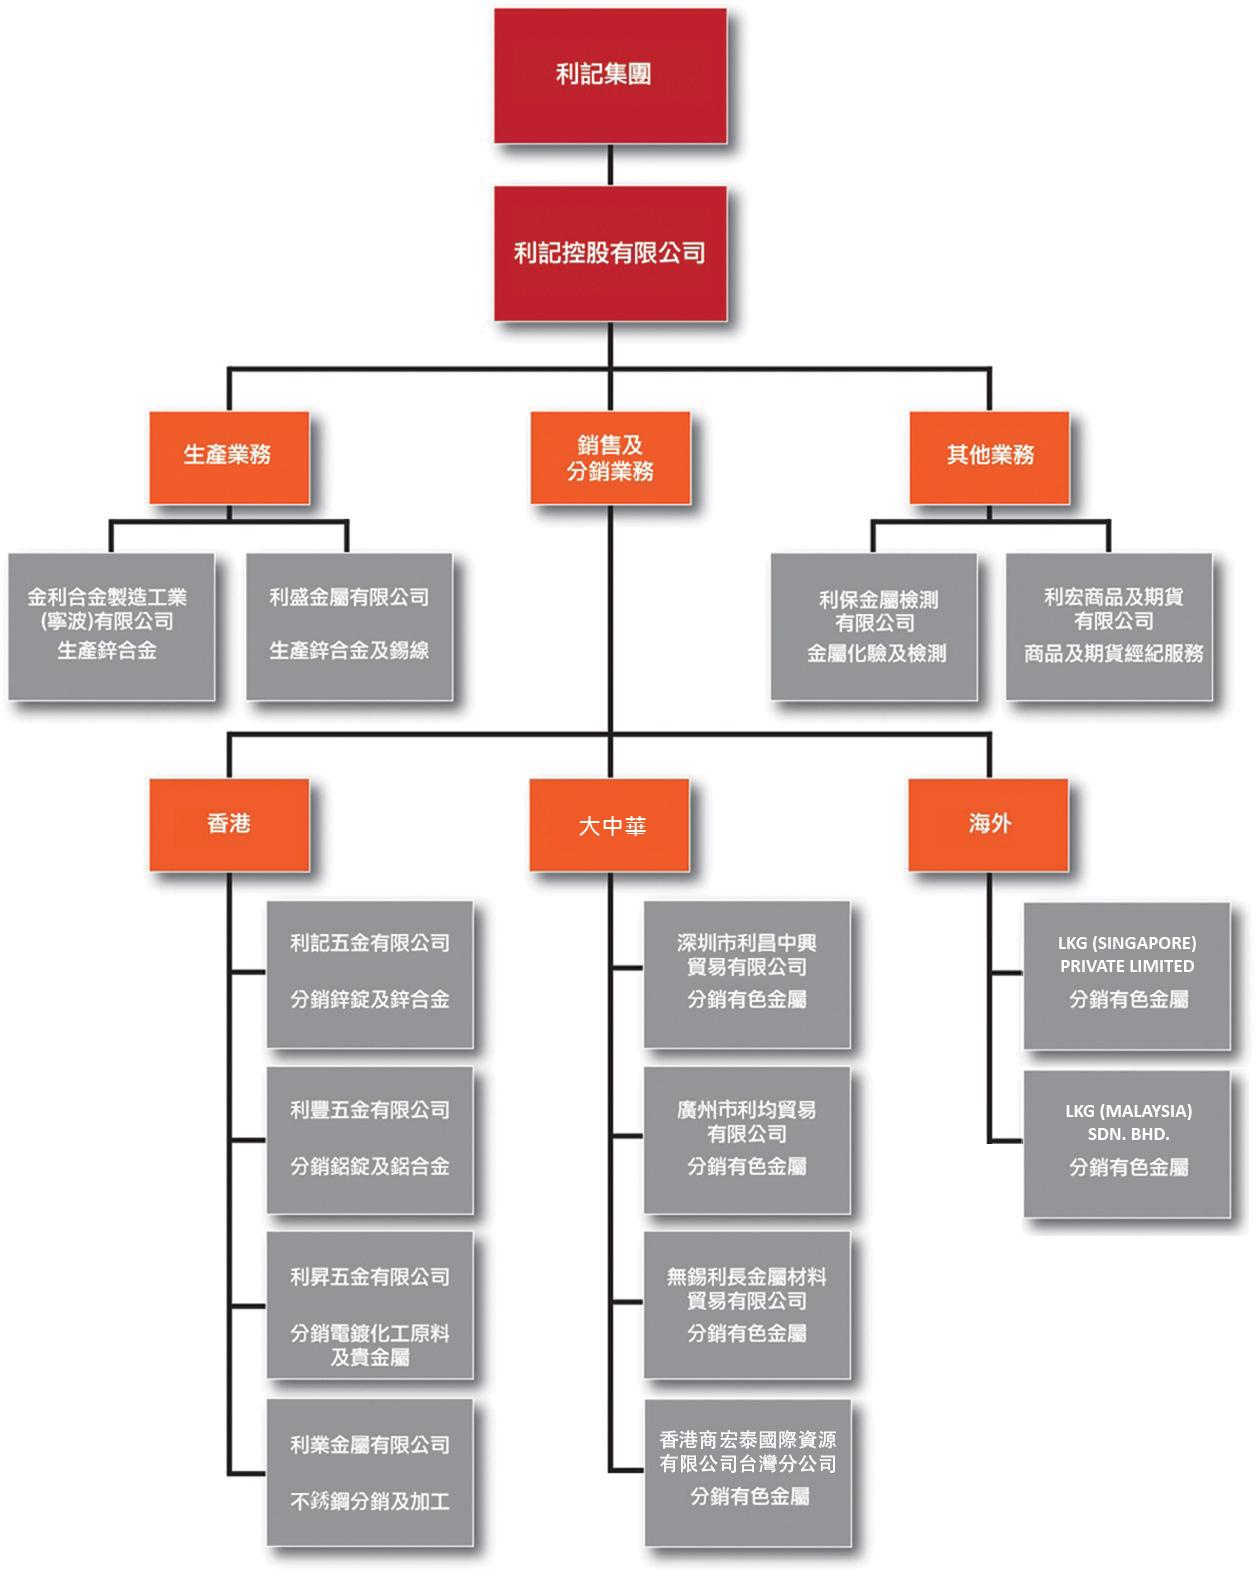 organization structure tc_180926